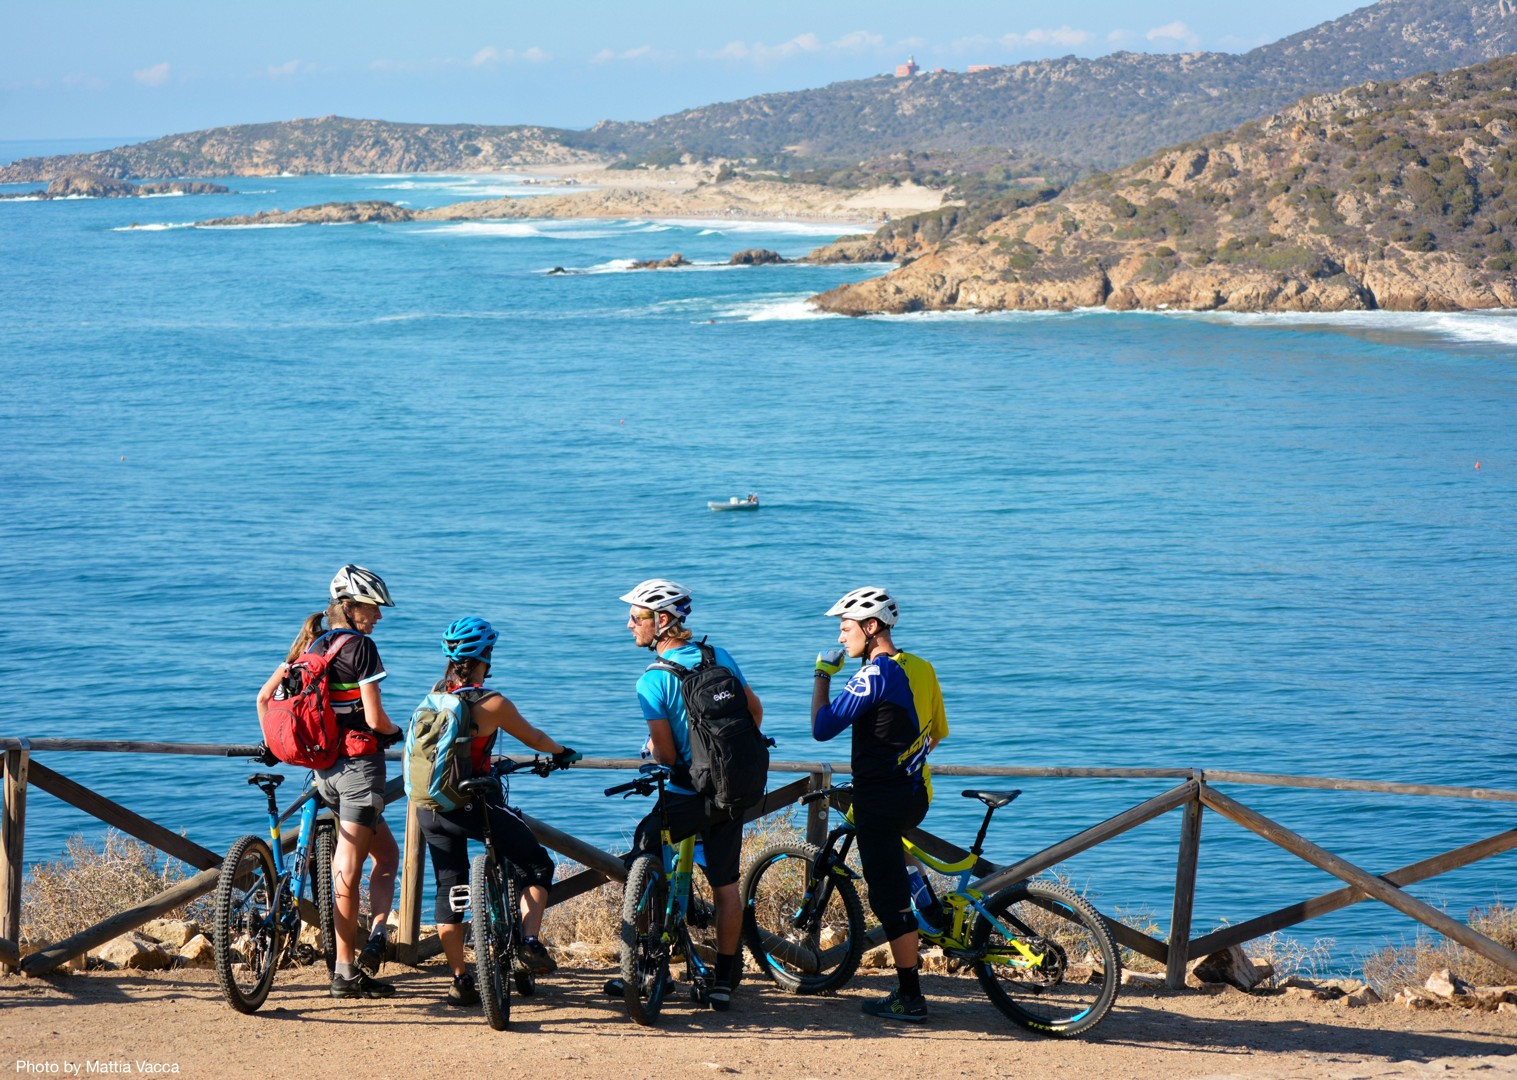 santadi-guided-mountain-bike-holiday-italy-sardinia-sardinian-enduro.jpg - Sardinia - Sardinian Enduro - Guided Mountain Bike Holiday - Italia Mountain Biking